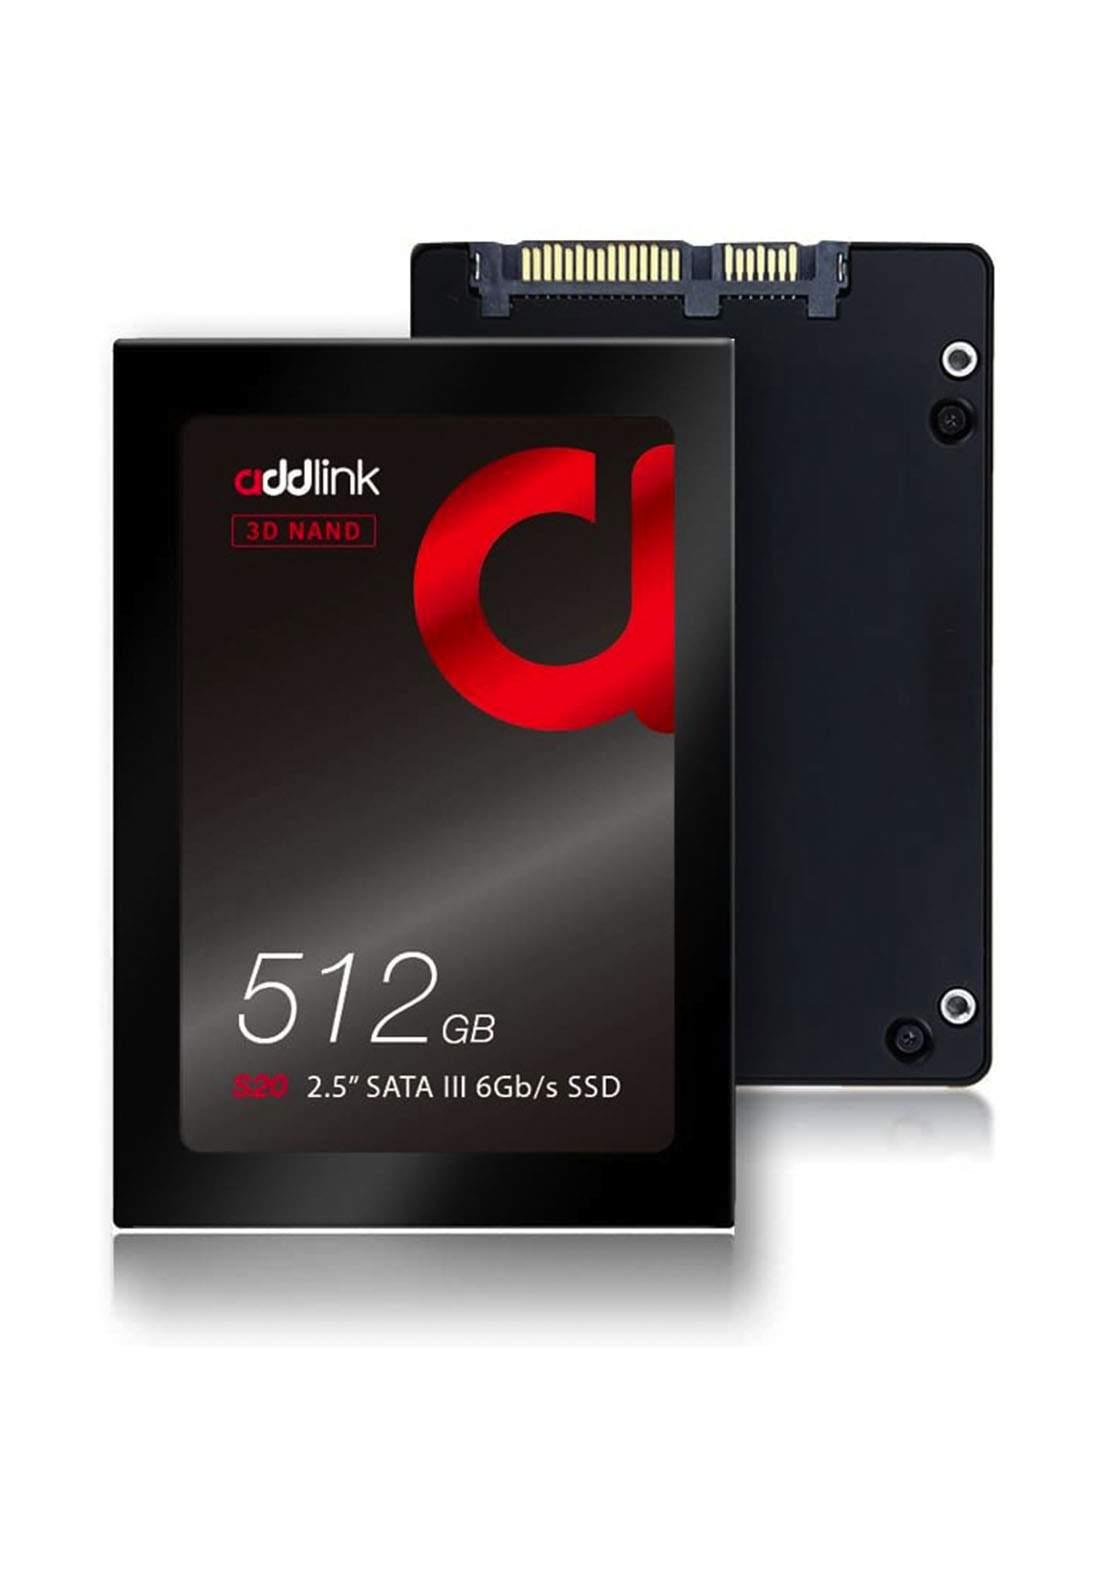 Addlink S20 512GB SSD 2.5 in SATA III 6Gbs 3D NAND Internal Solid State Drive - Black هارد داخلي